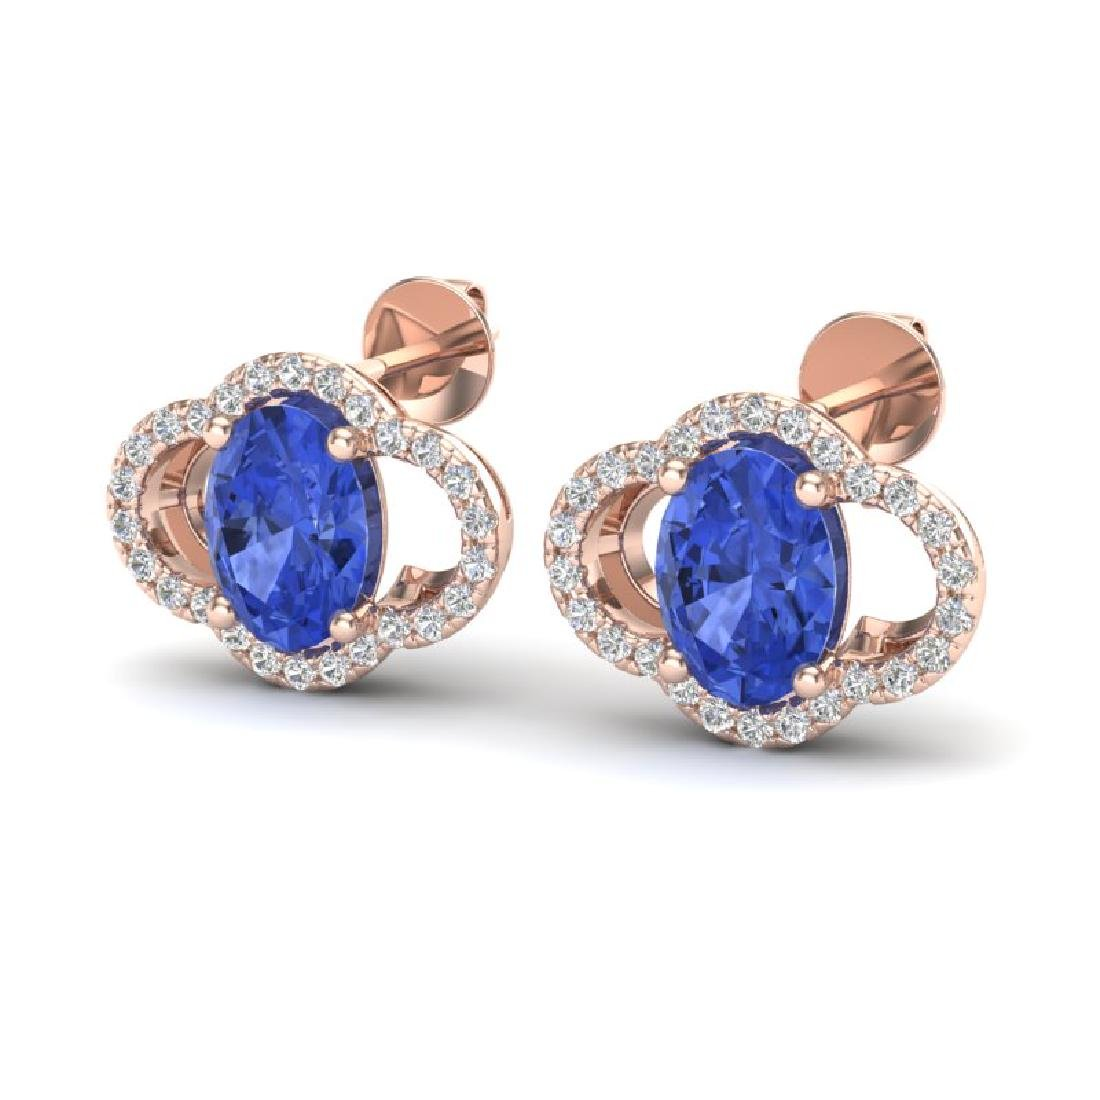 3.50 CTW Tanzanite & Micro Pave VS/SI Diamond Earrings